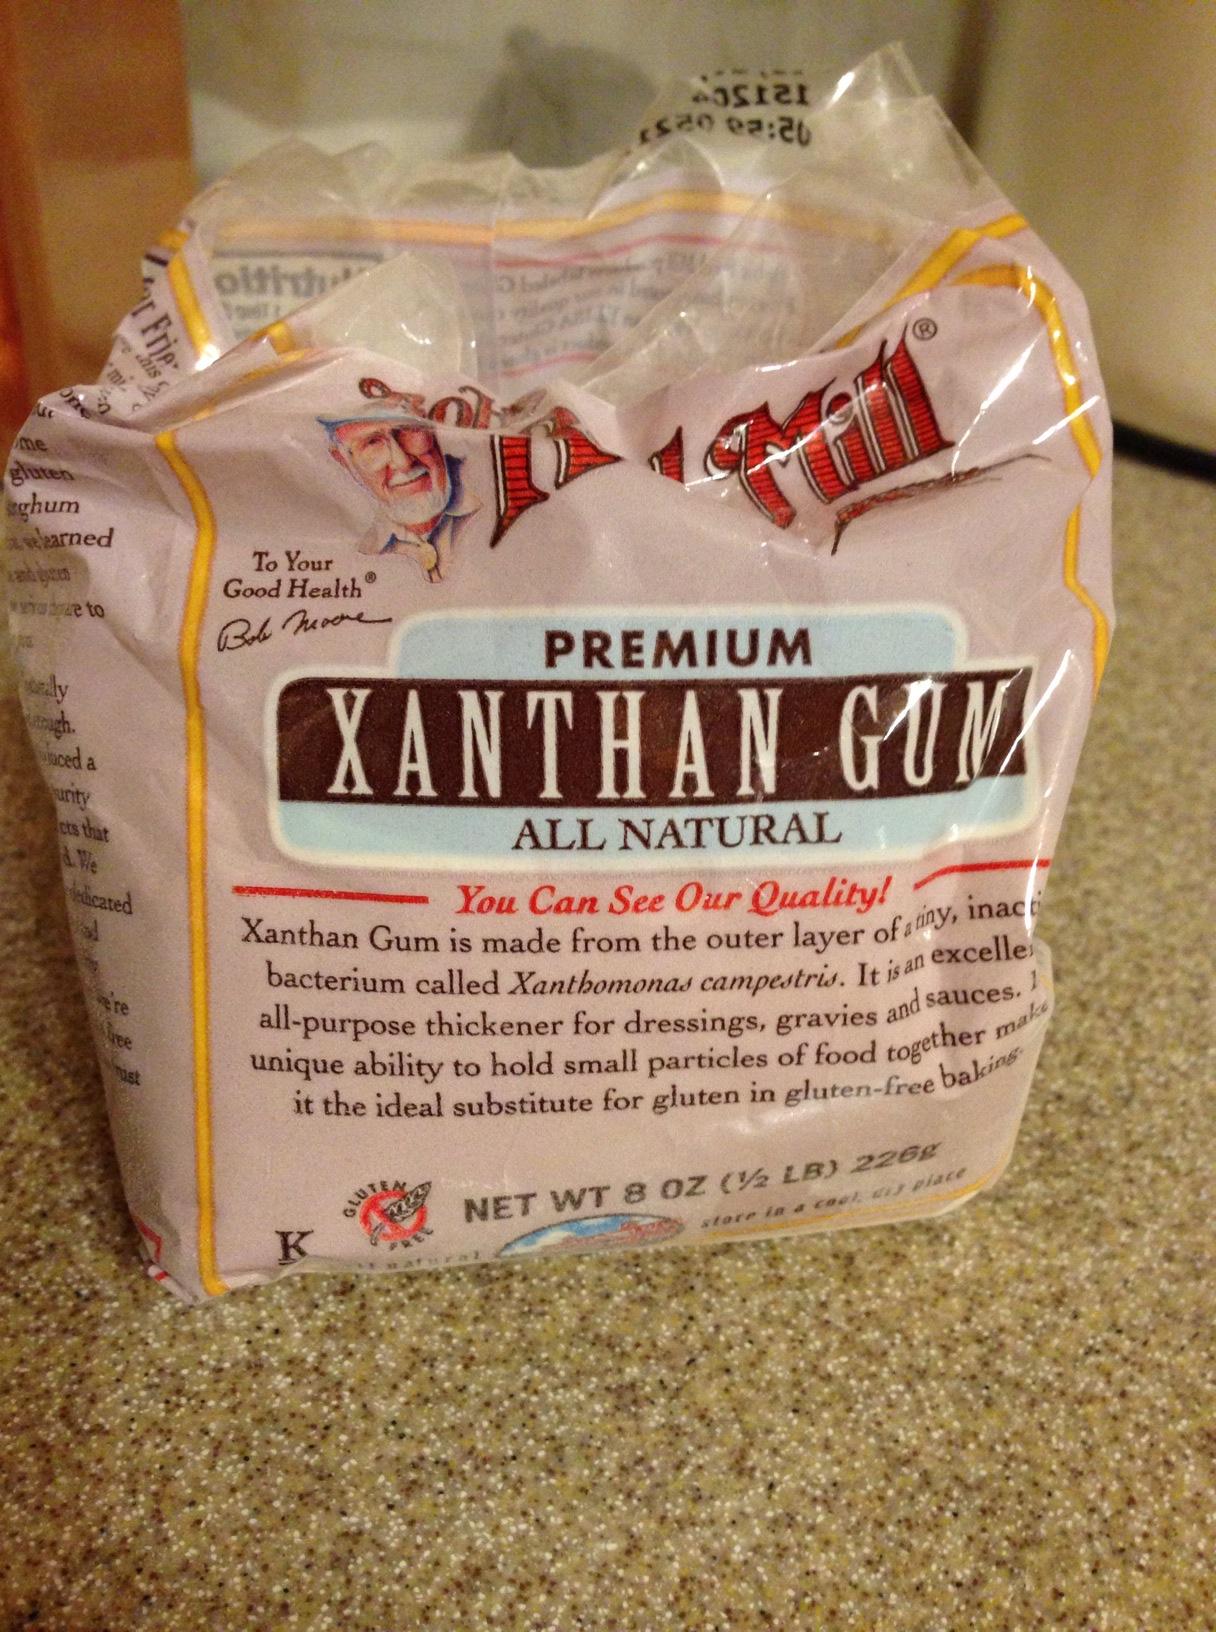 Xanthian gum